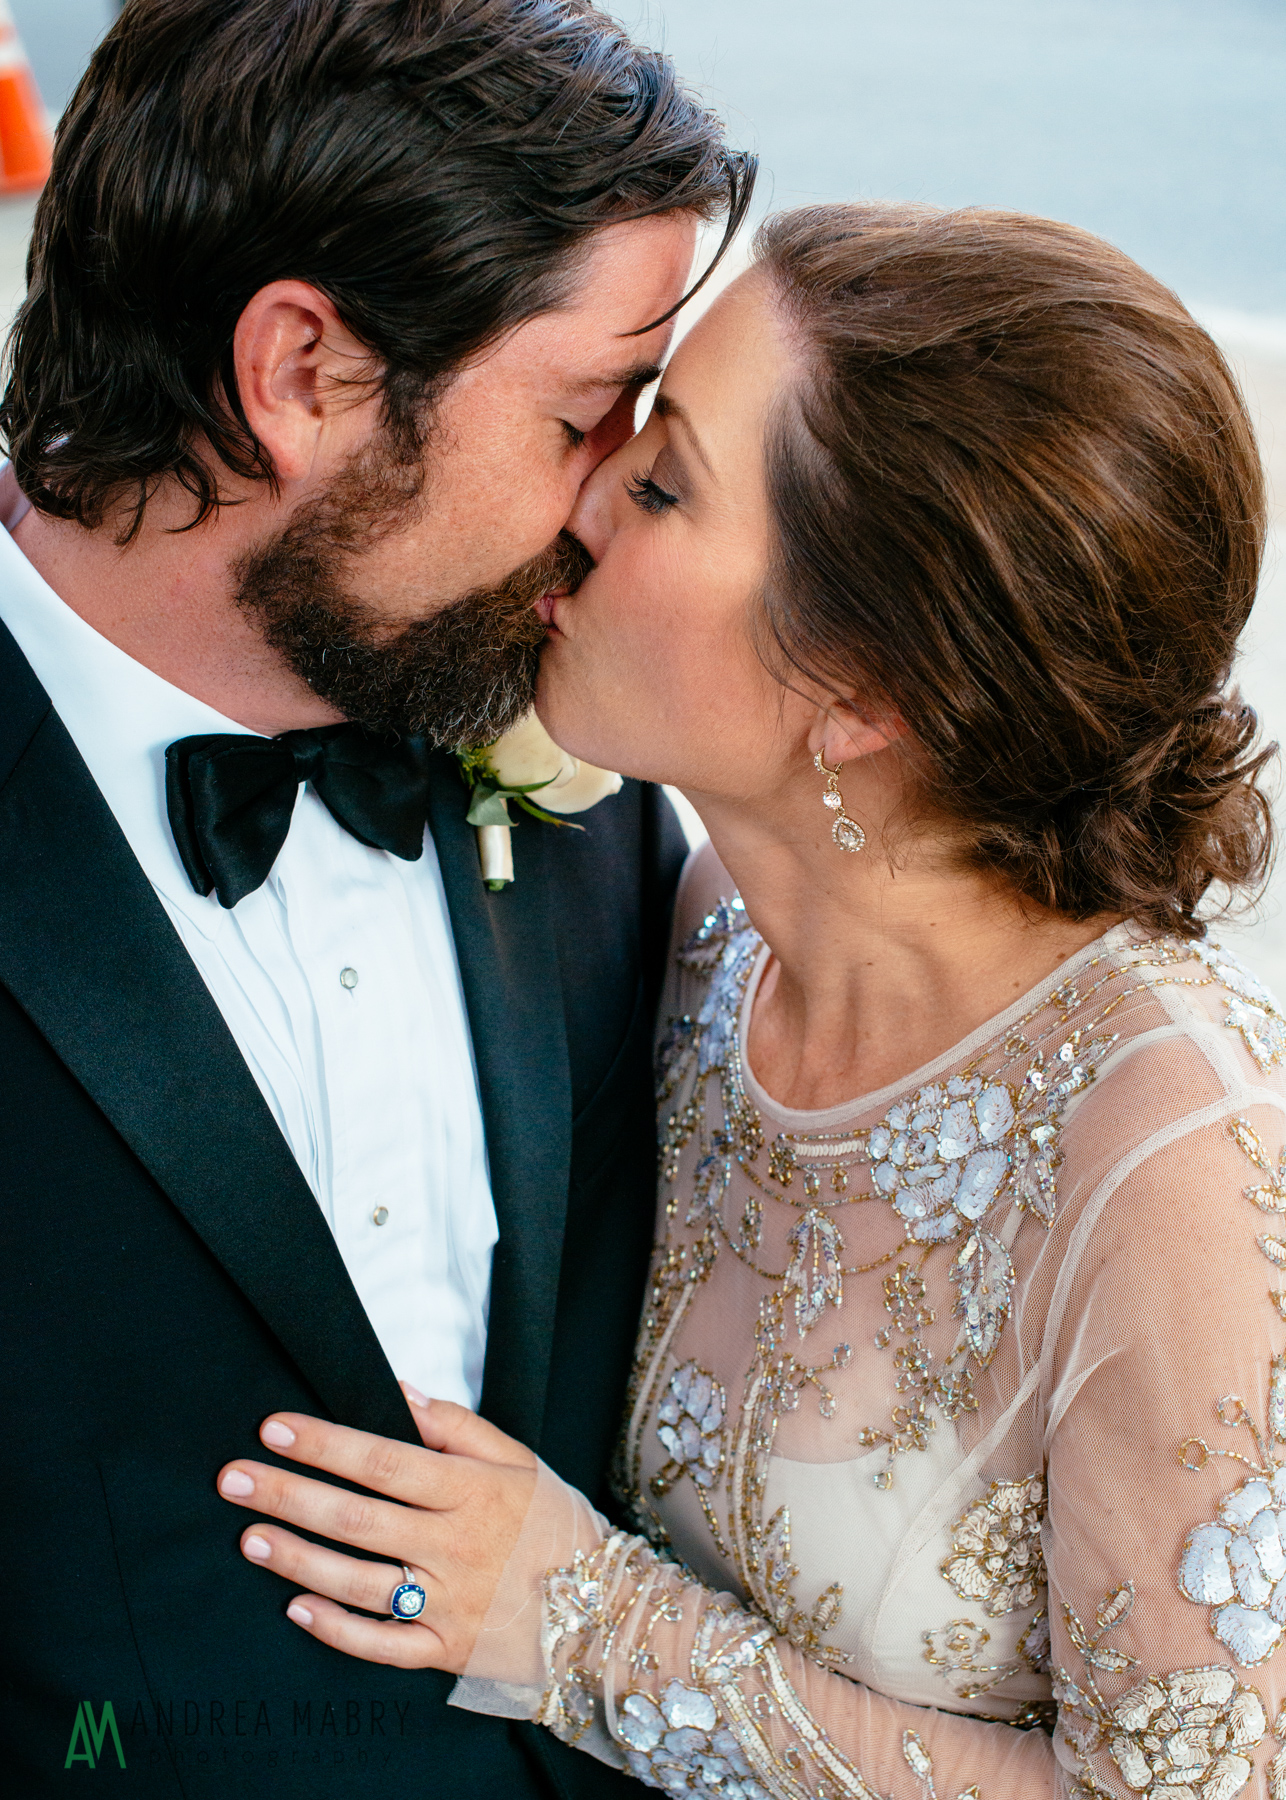 Wedding Portraits.  Government Street Presbyterian Church Mobile Wedding. Andrea Mabry Photography.